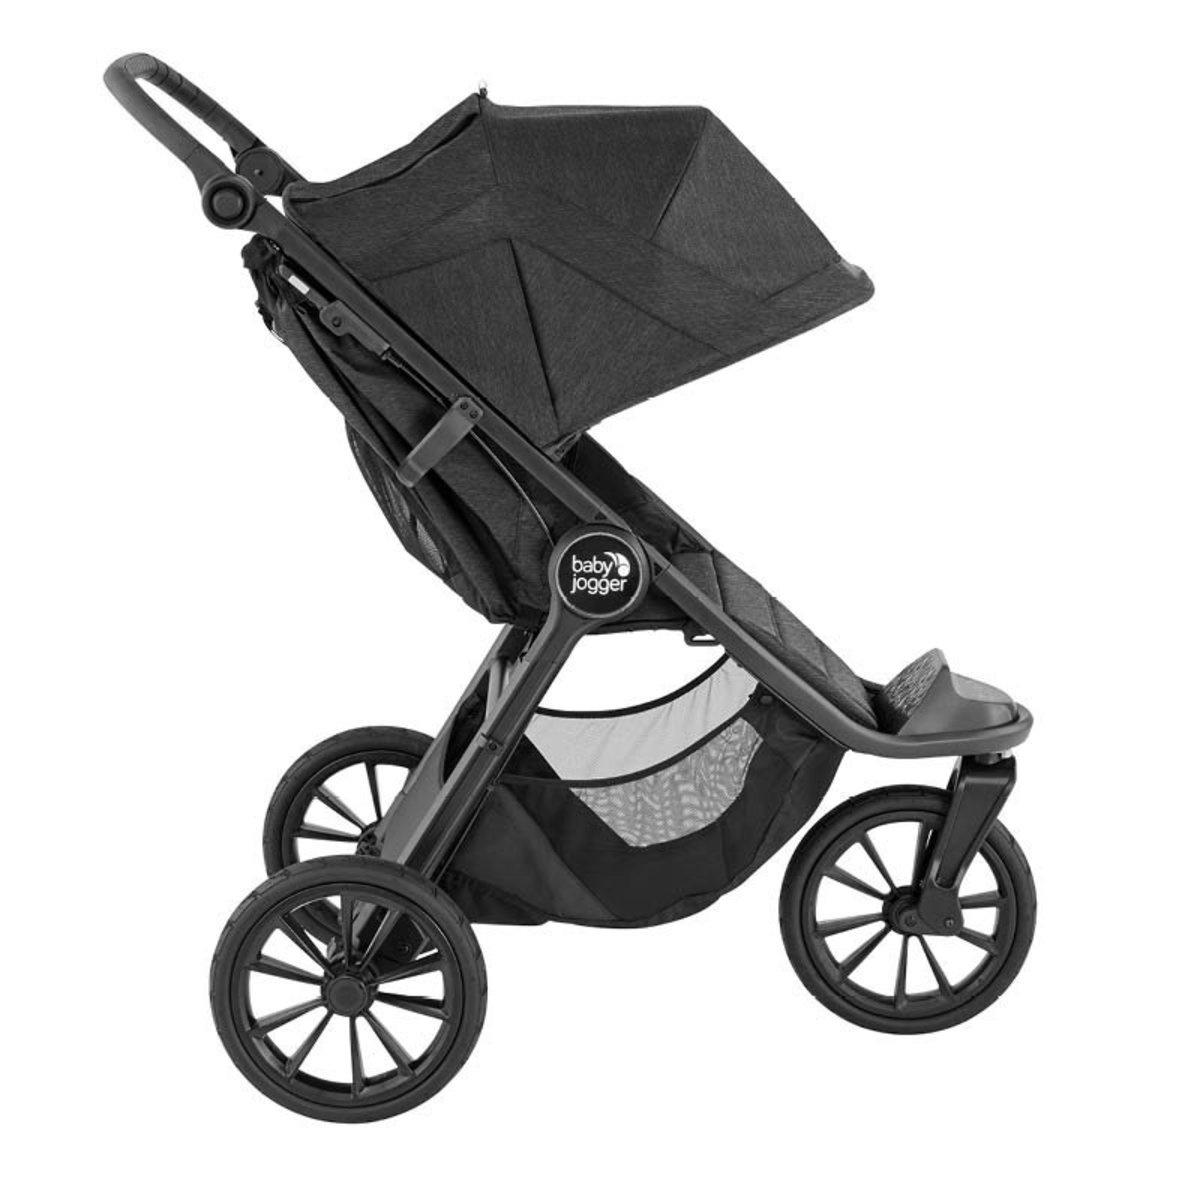 Baby Jogger Baby Jogger City Elite 2